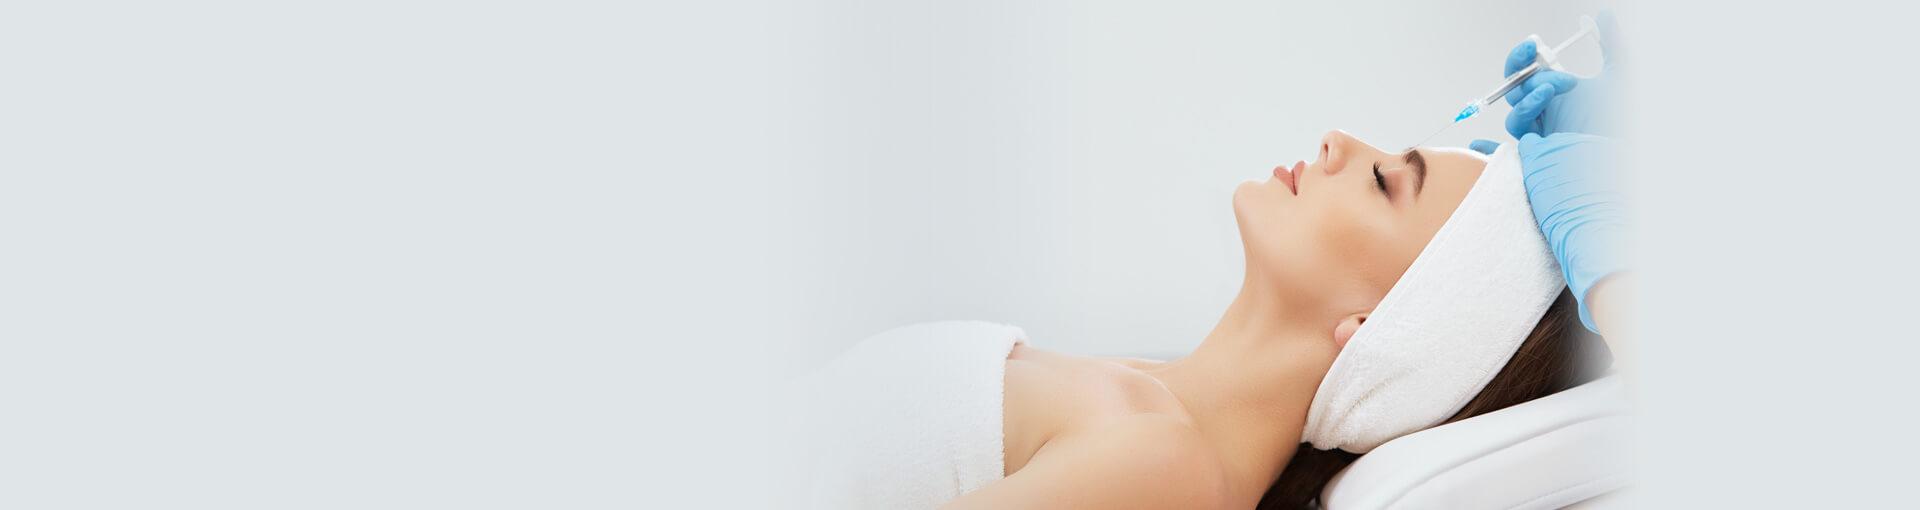 Botox/Dysport - drs skin care